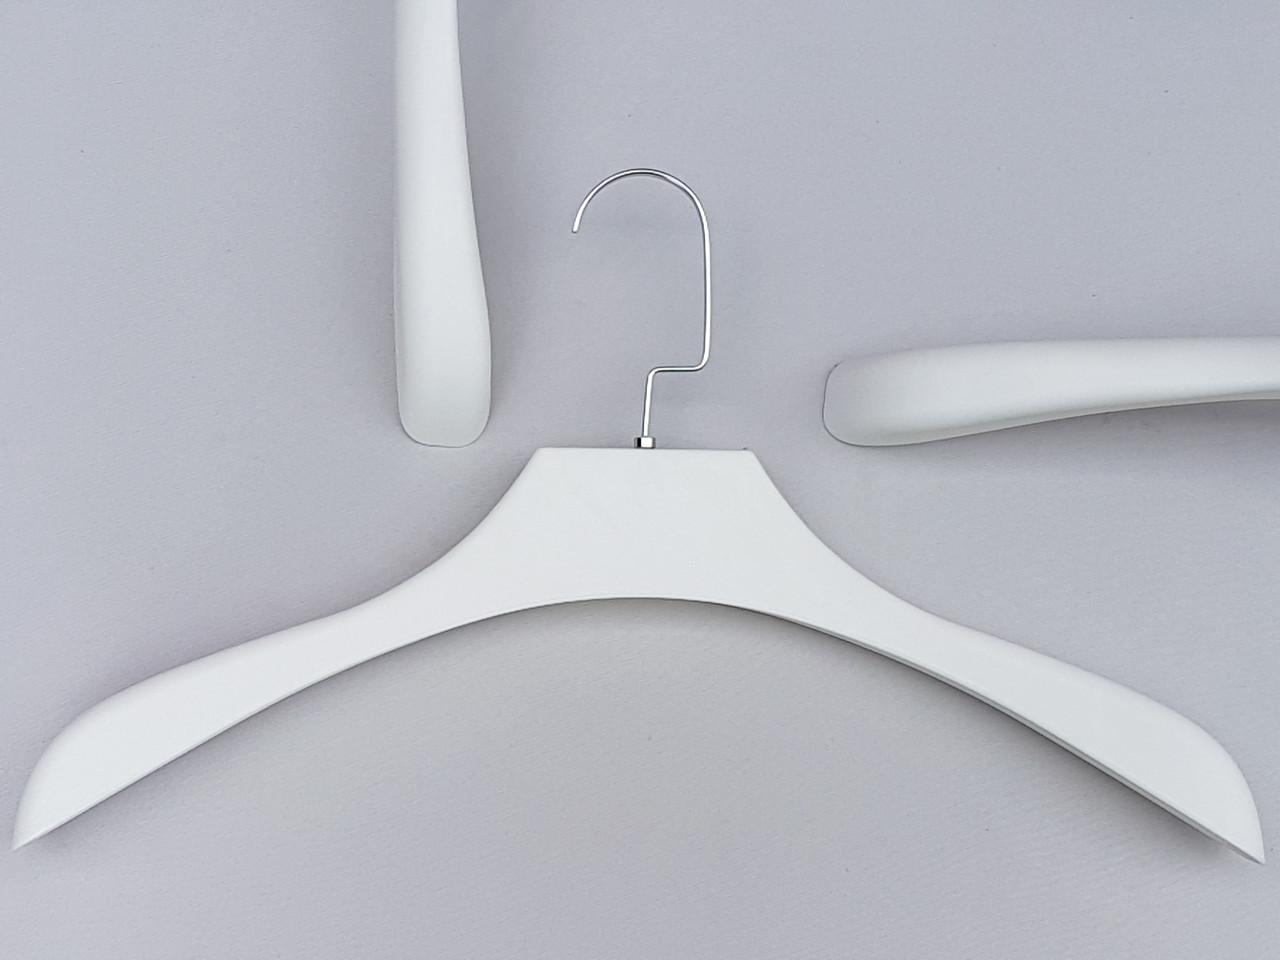 Плечики вешалки тремпеля TZF1102 белого цвета, длина 43 см